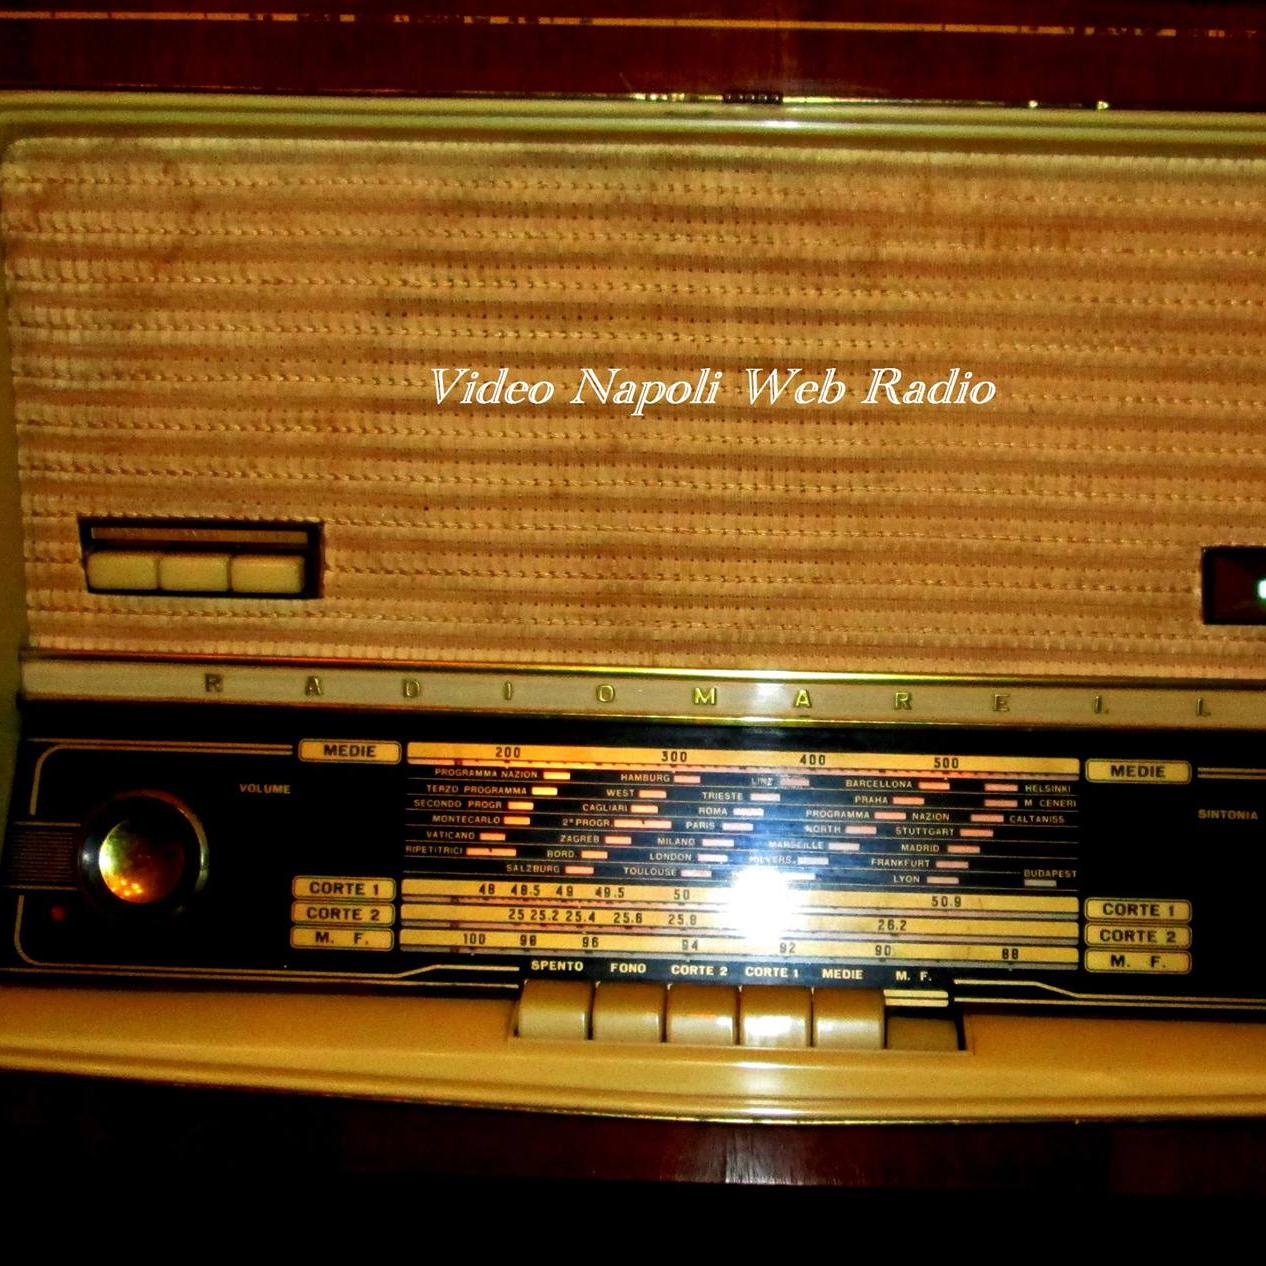 Video Napoli Web Radio